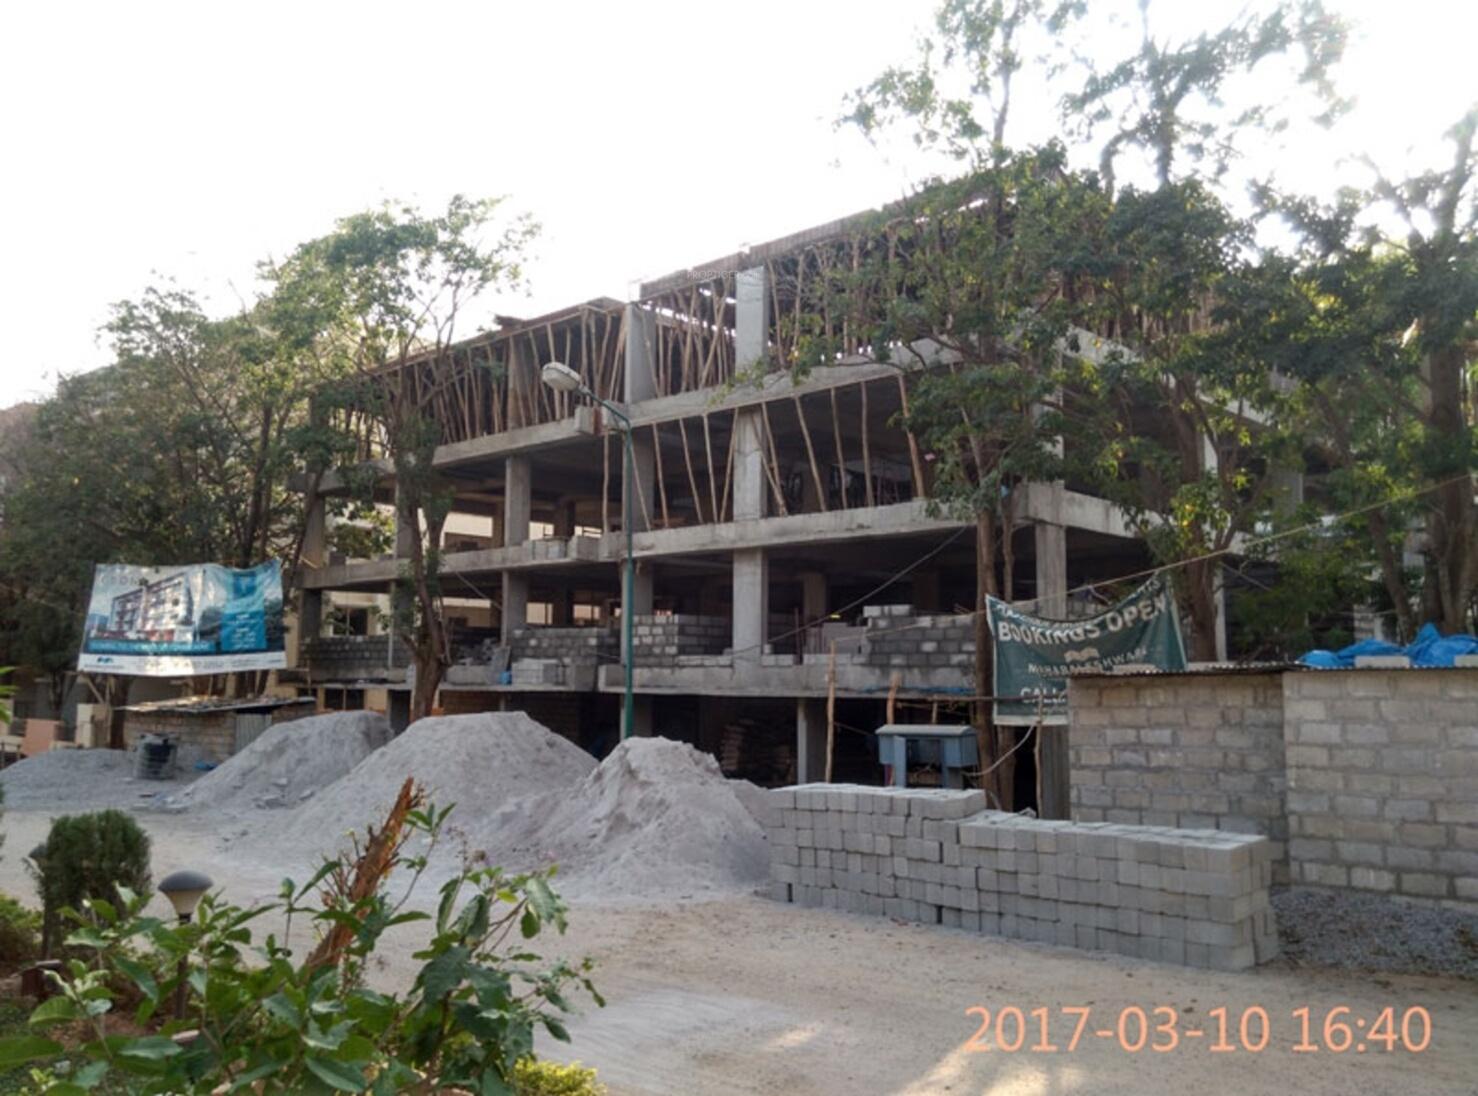 Mahabaleshwara classique ebony in yelahanka bangalore for Construction classique